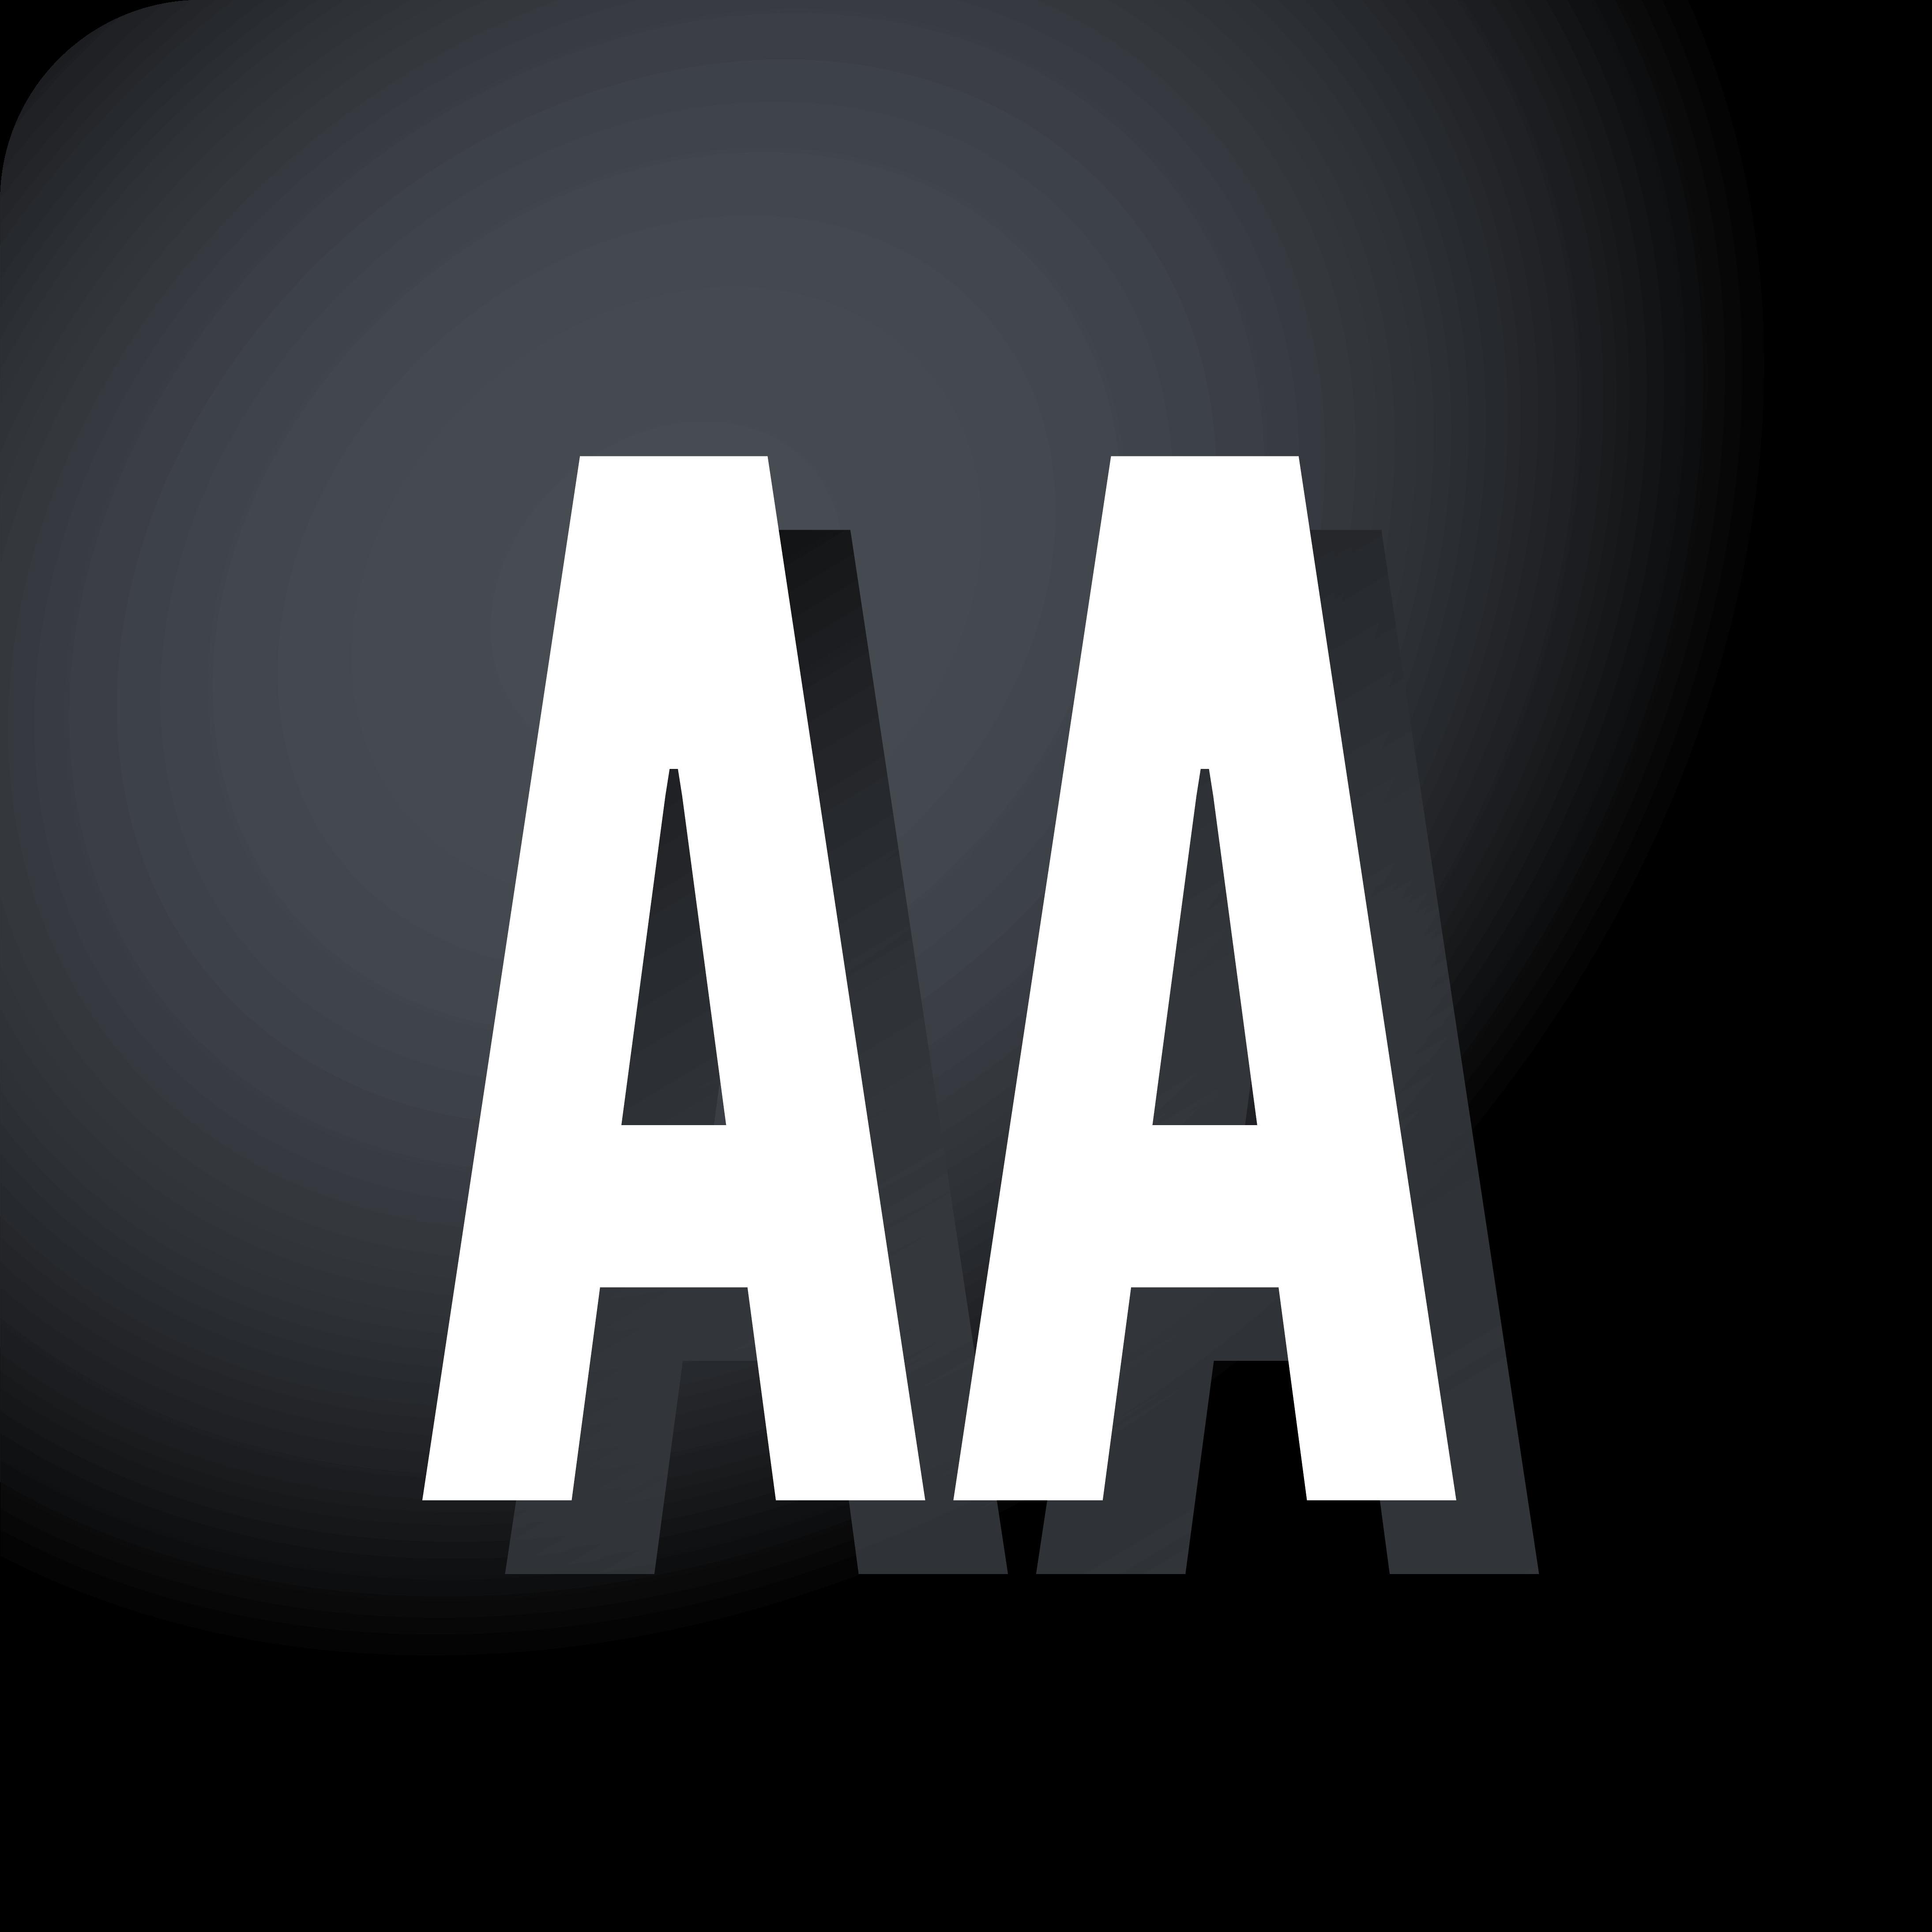 main_image-AA